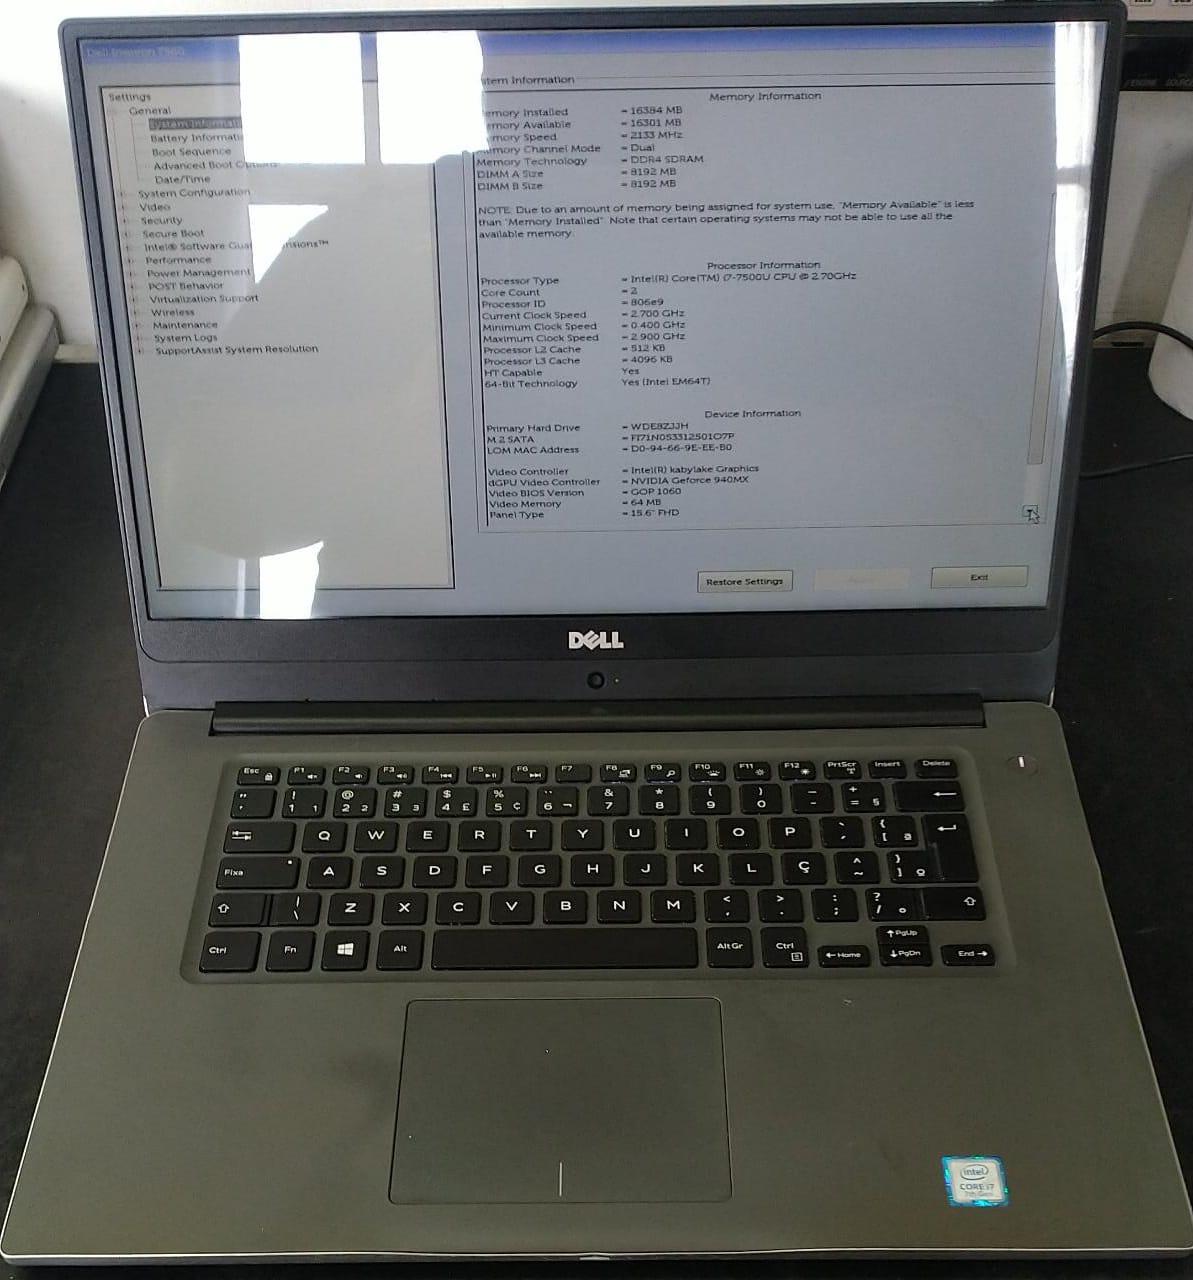 Notebook Dell Inspiron 15 7560 I7/16GB/128GB/1TB/940MX